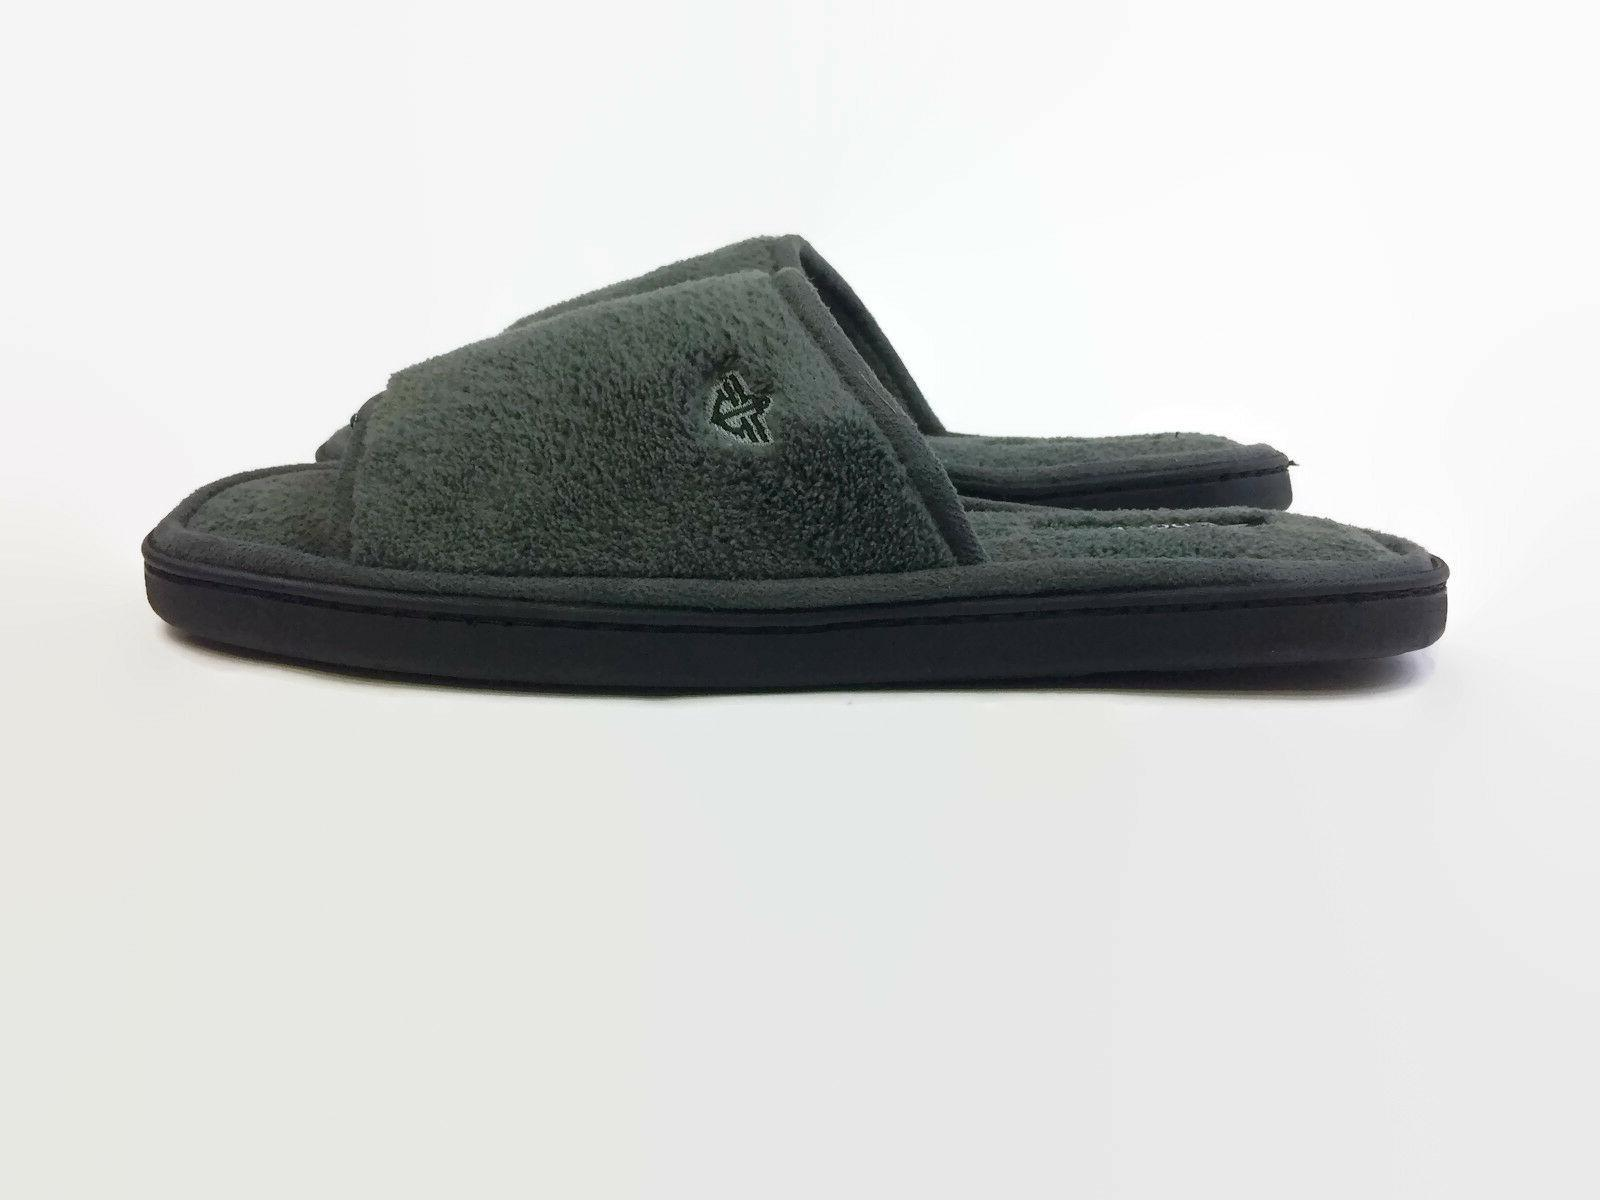 Dockers Men's Terry Slide Slippers with Memory Foam